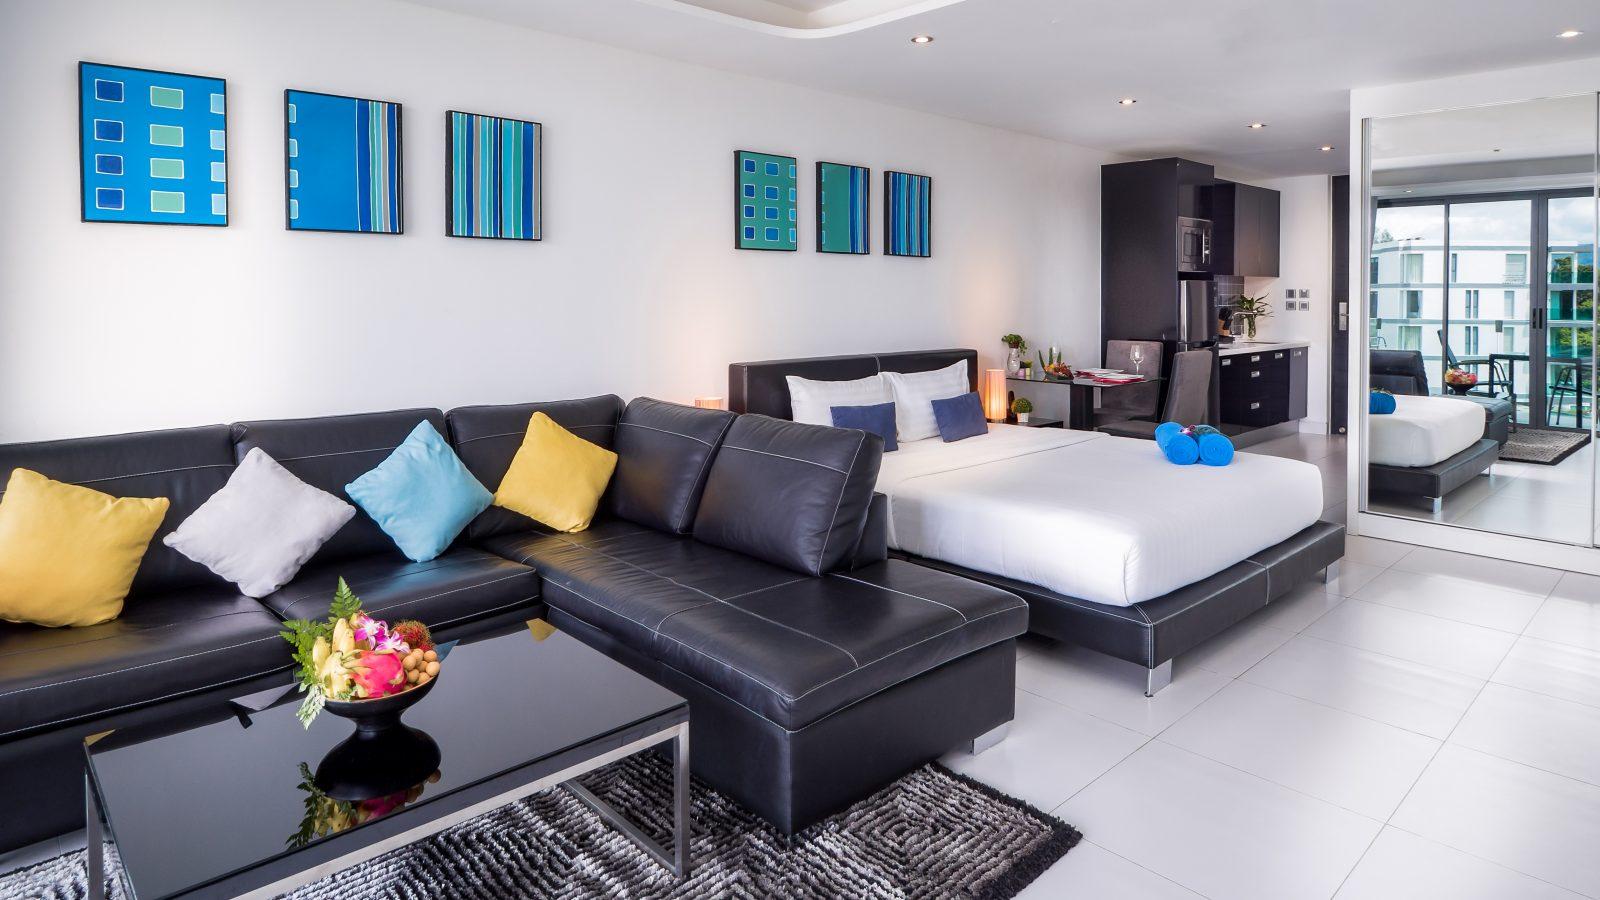 Holiday Rentals in Phuket